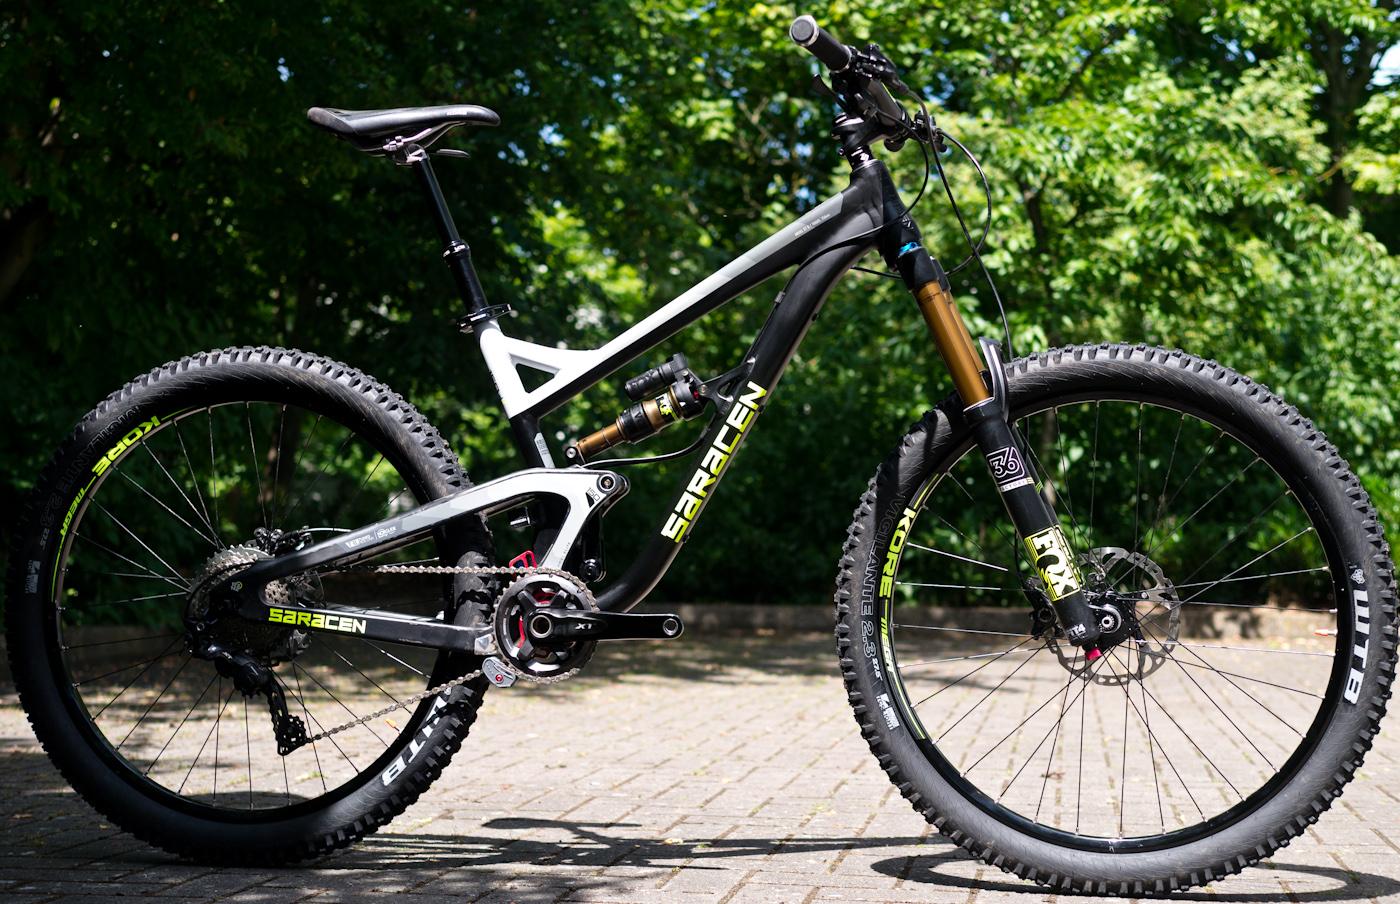 2016 Saracen Bikes Myst Kili Flyer Ariel And Mantra